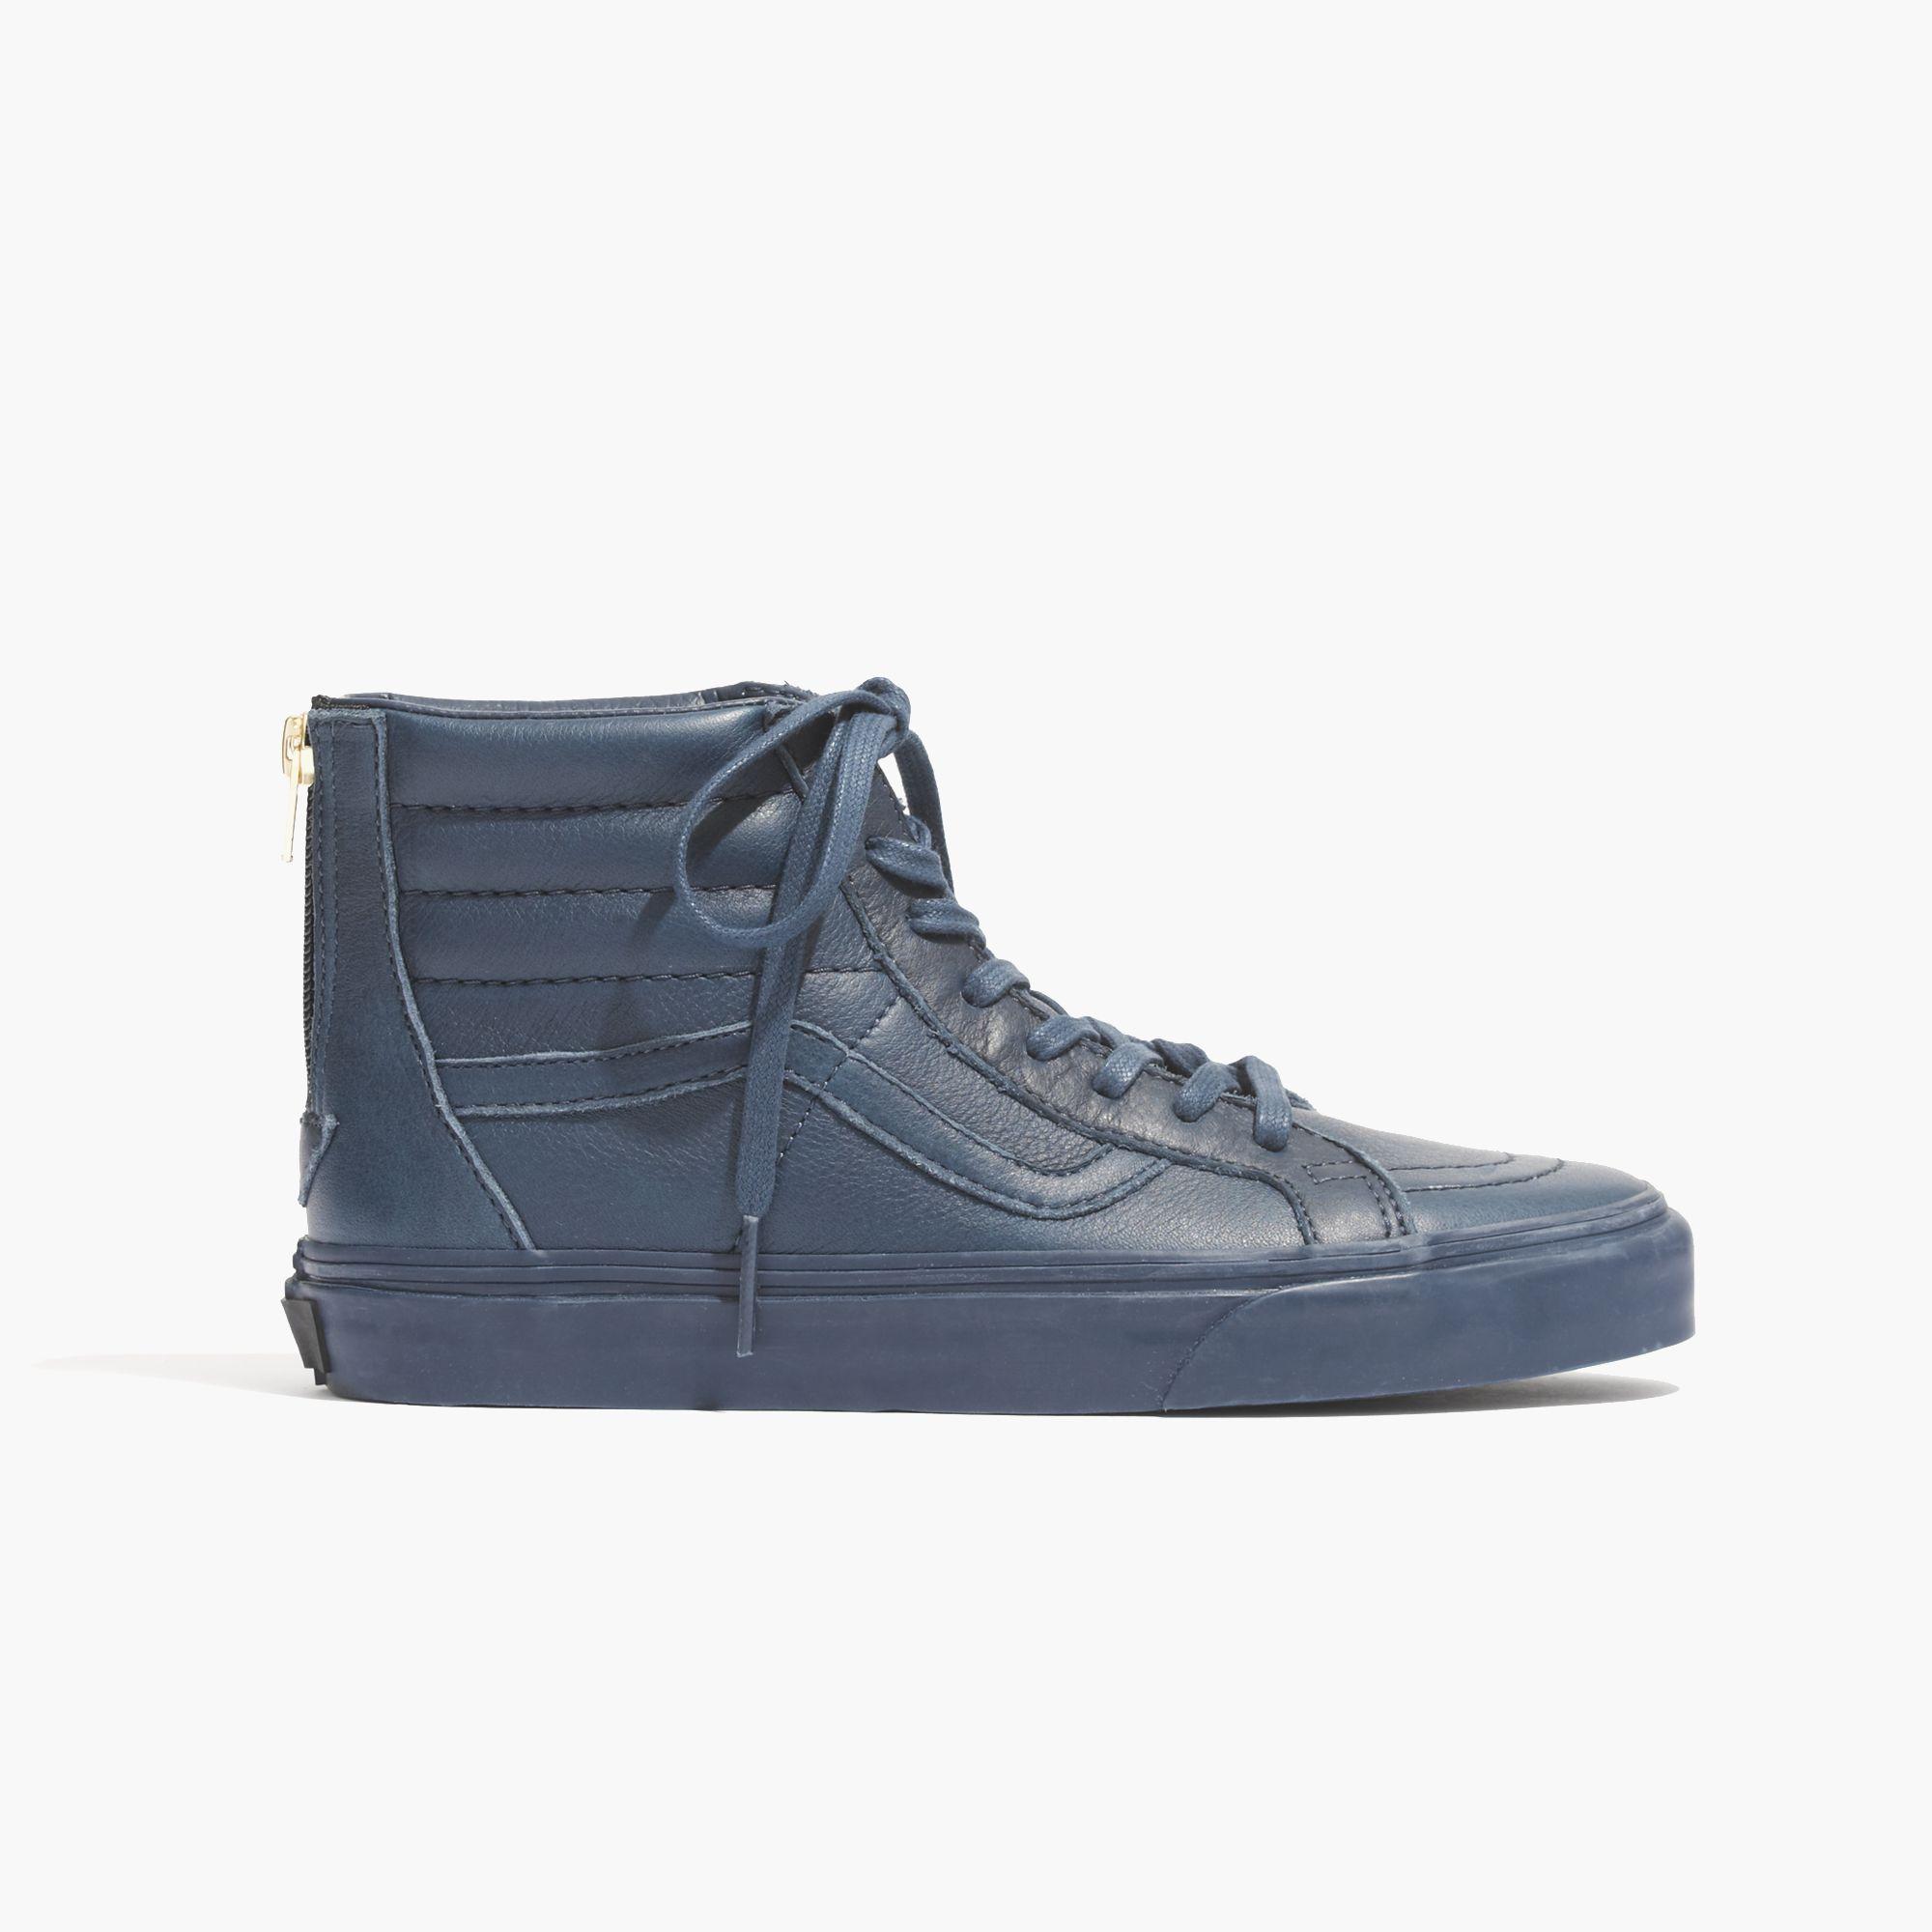 7281c7db7a Lyst - Madewell Vans Reg  Sk8-Hi Zip Tonal High-Top Sneakers In ...